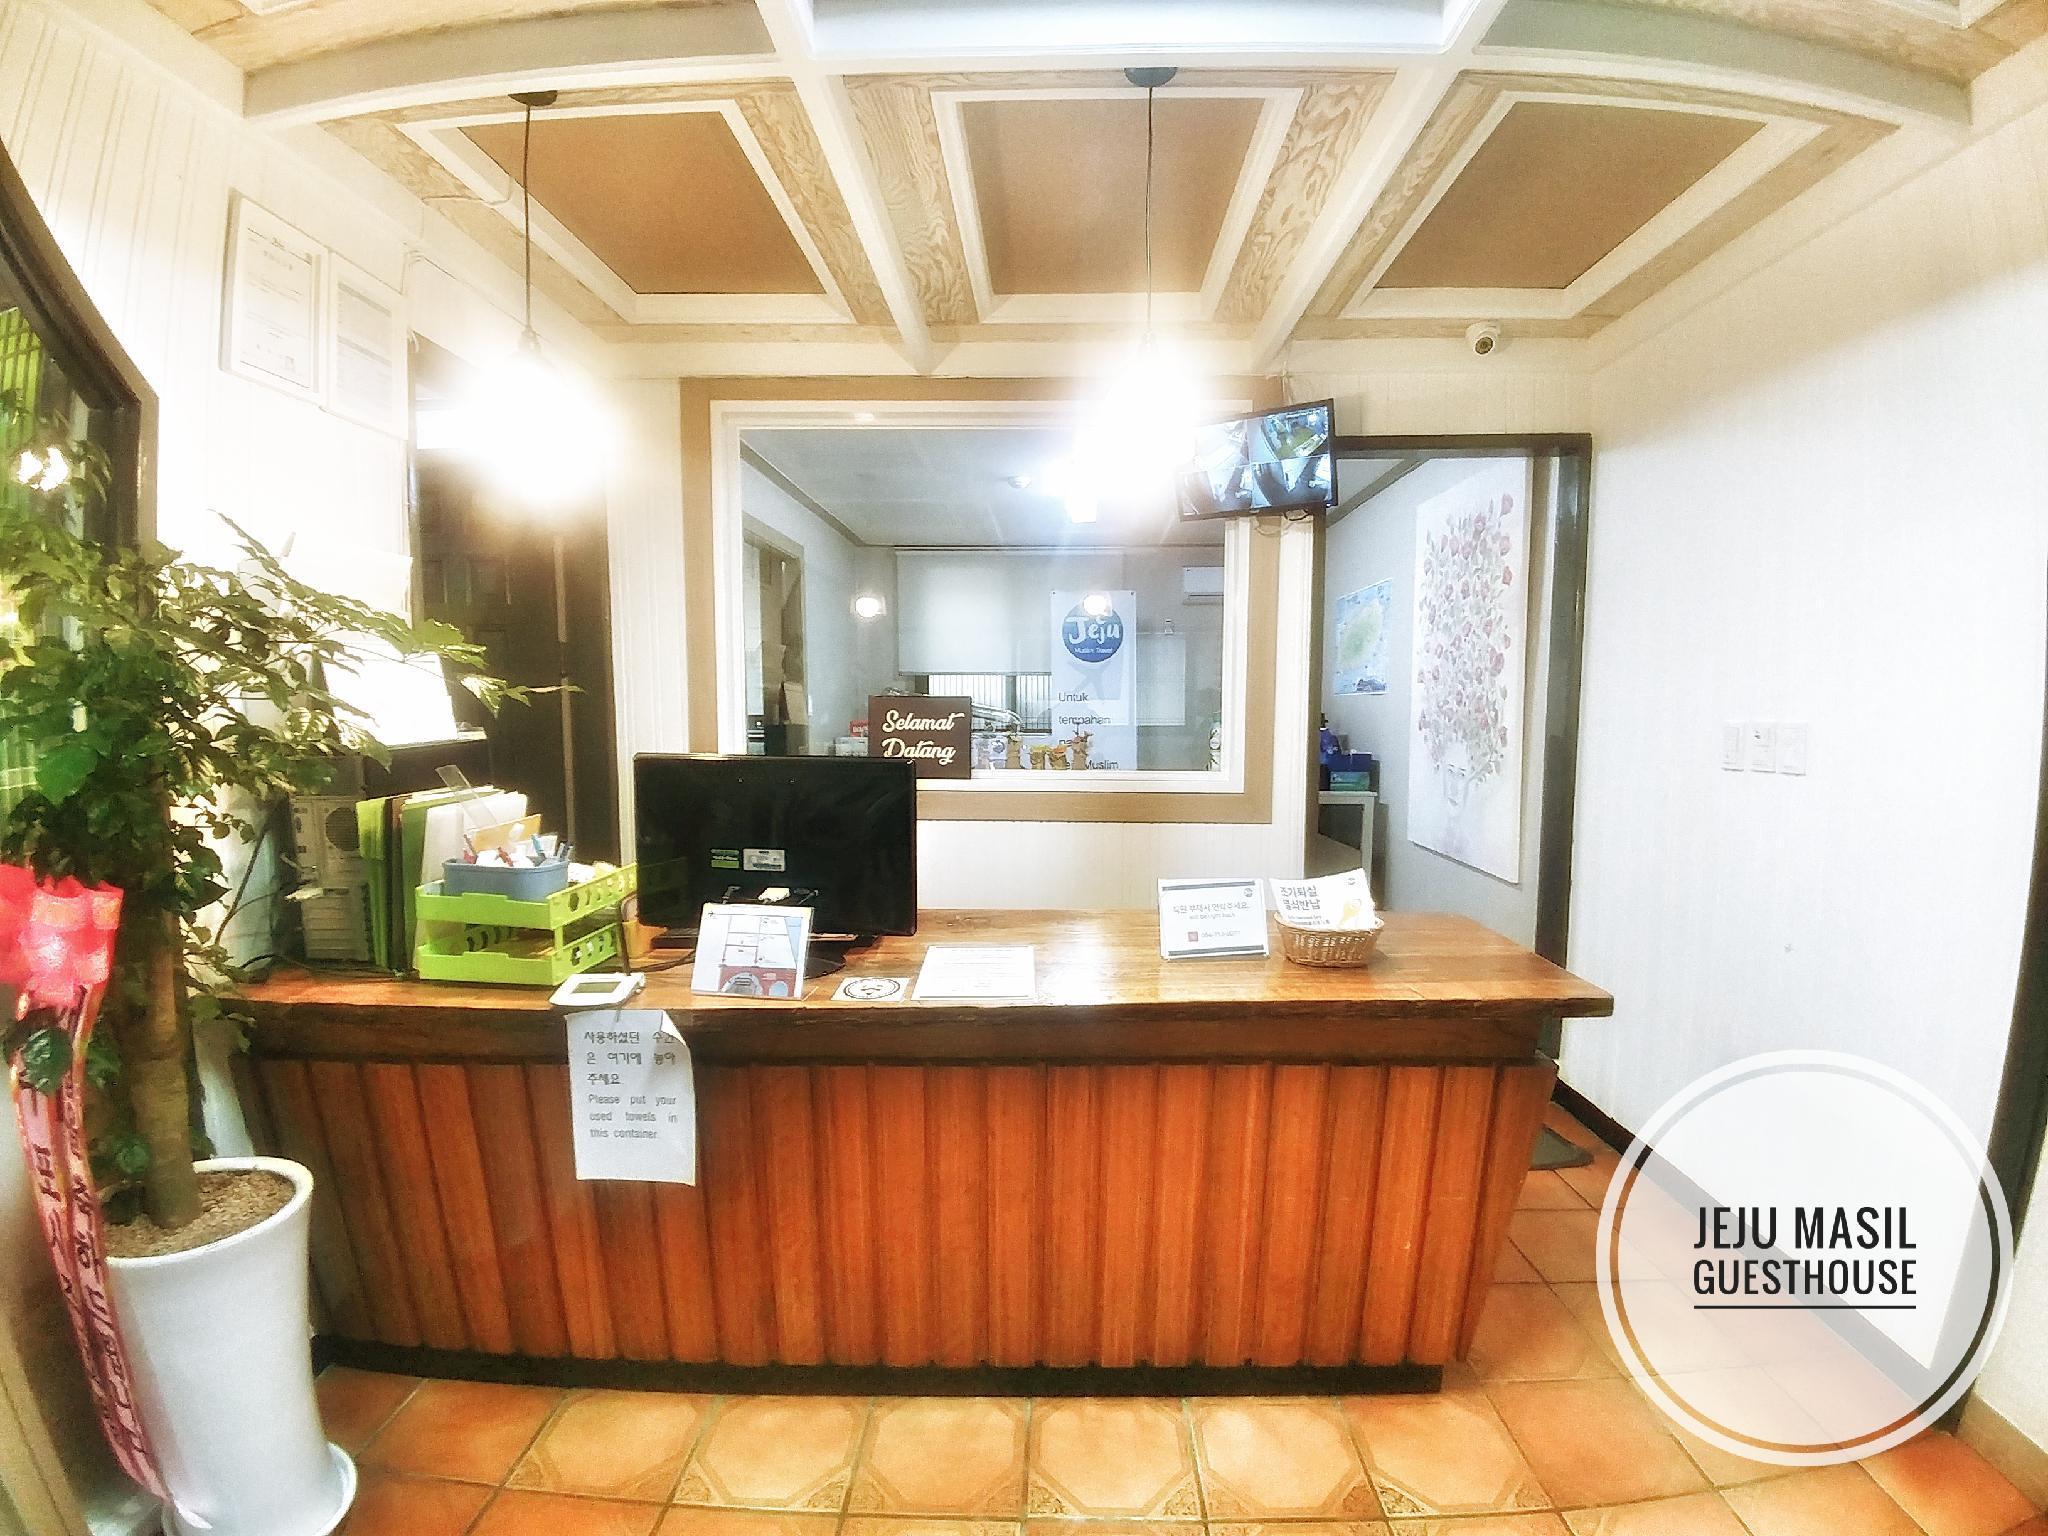 Masil Guesthouse Jeju, Jeju